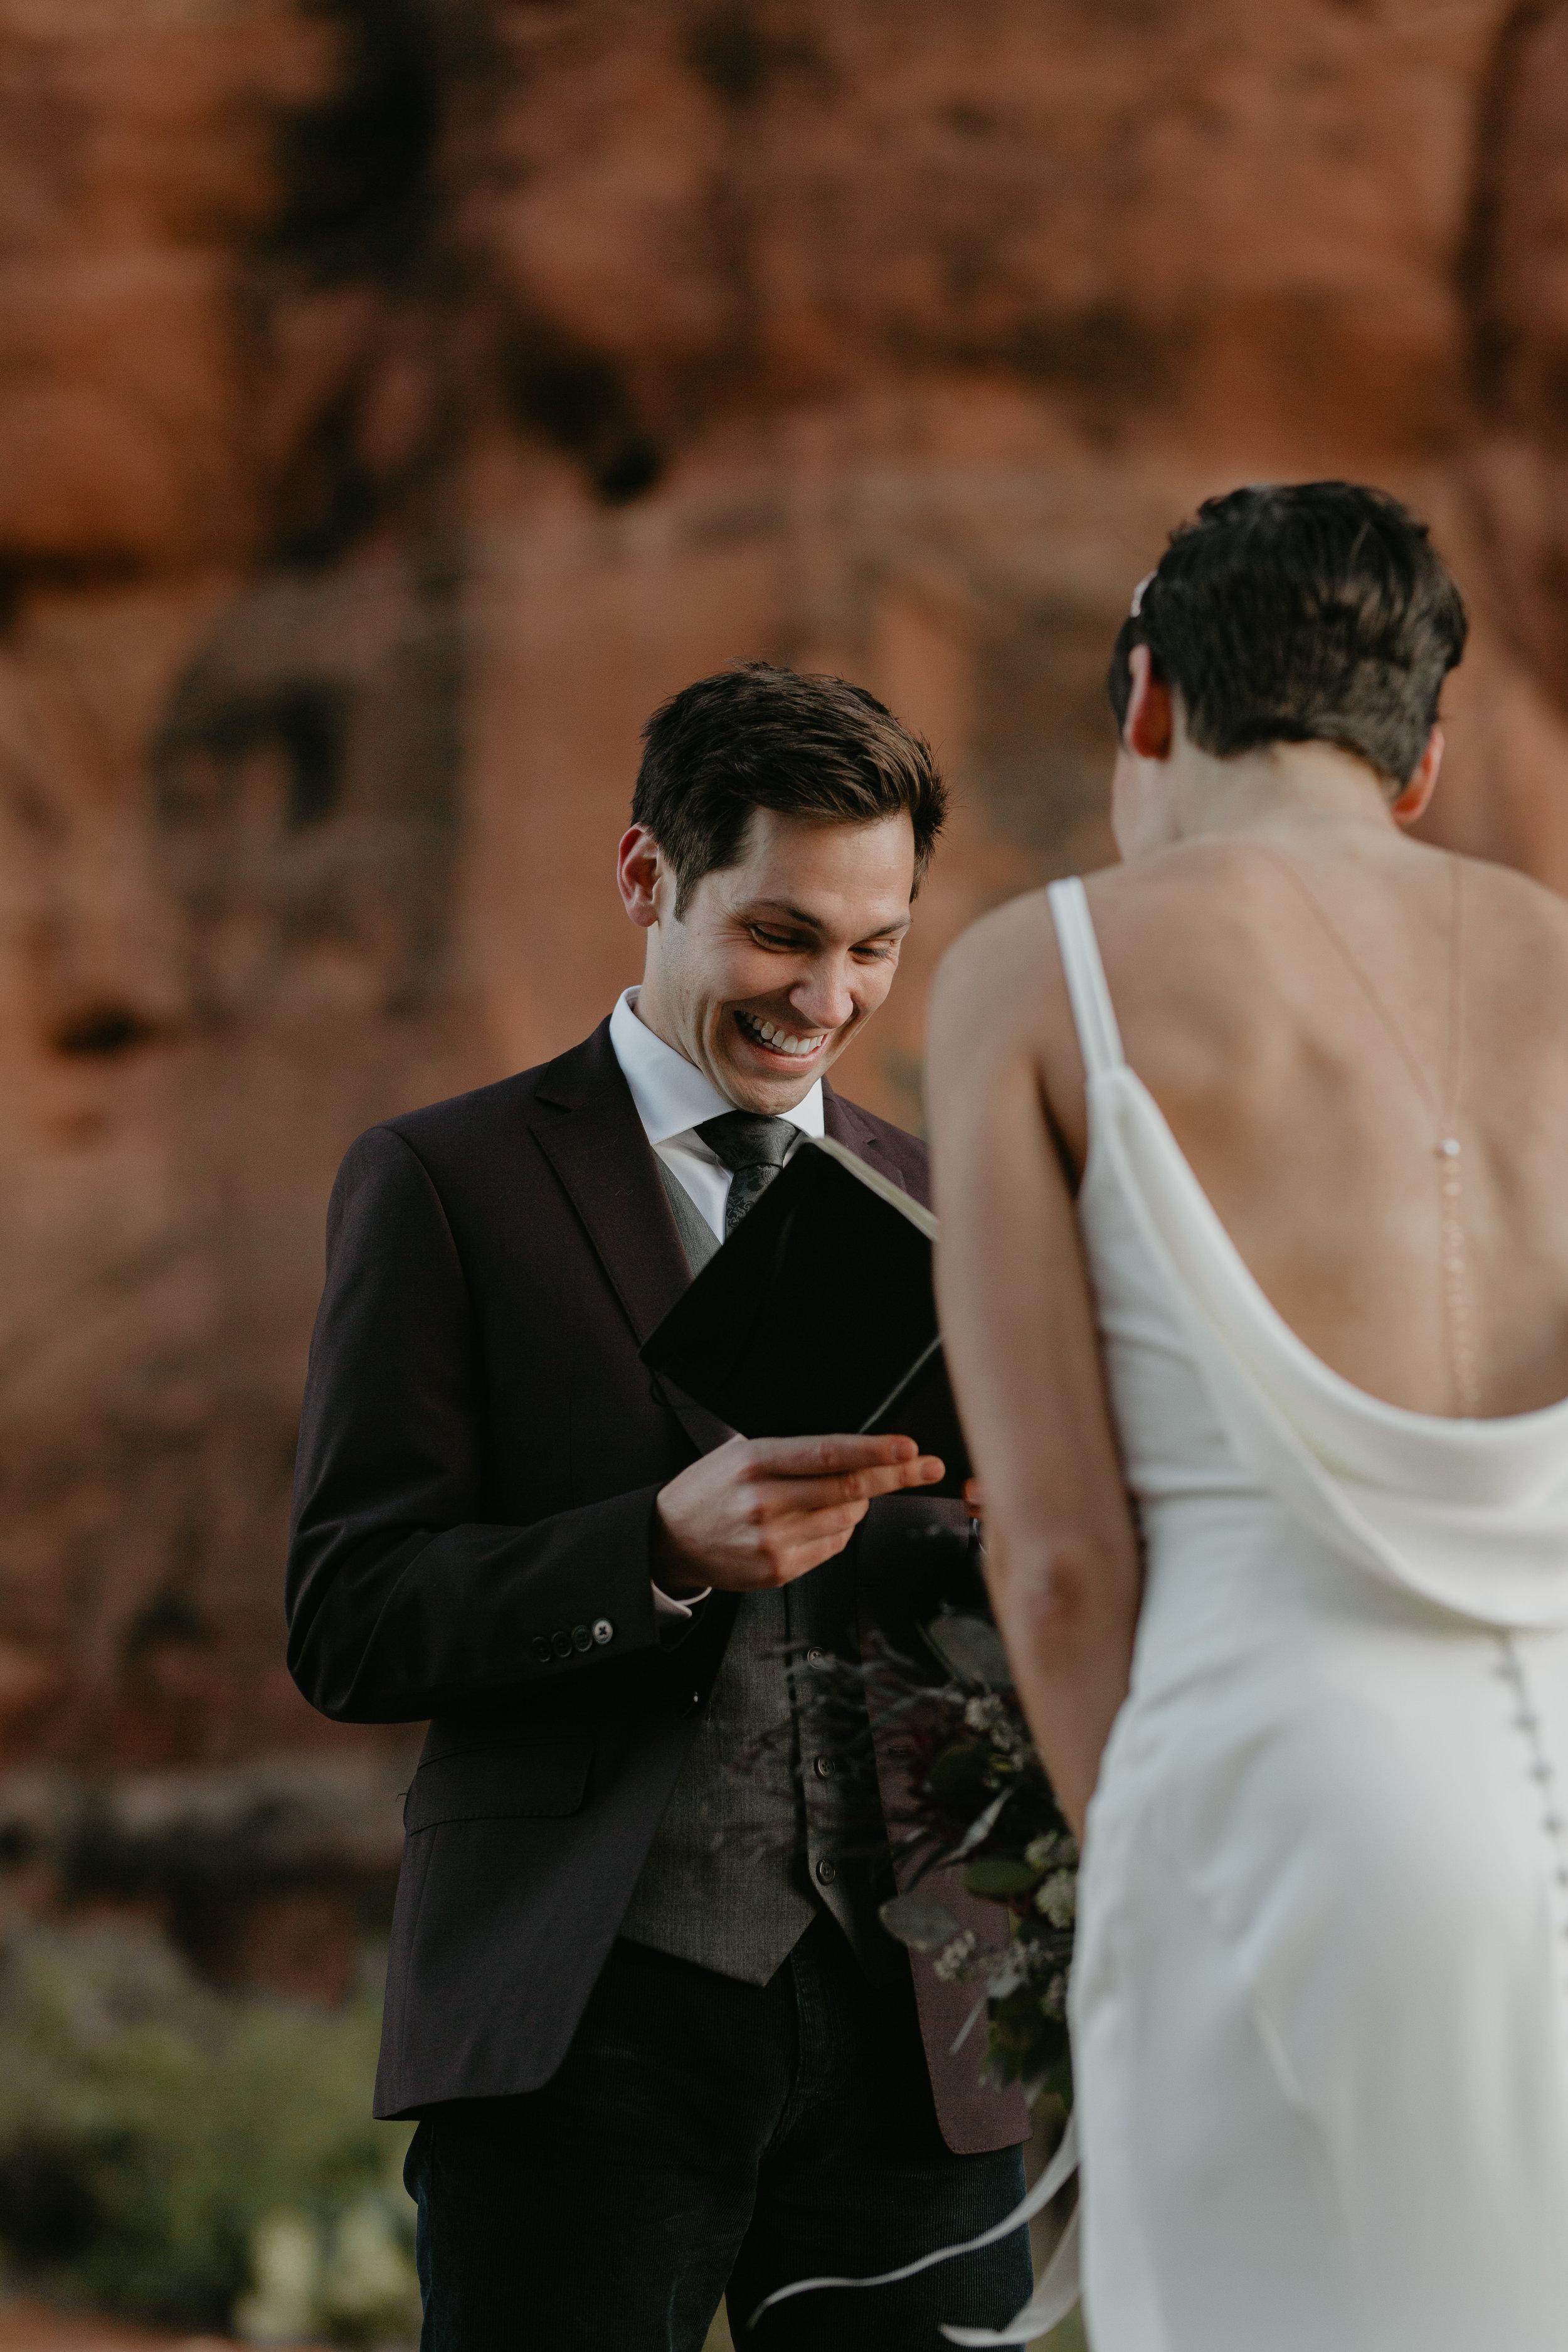 nicole-daacke-photography-sedona-arizona-destination-elopement-wedding-photographer-catherdral-rock-hiking-elopement-sedona-river-elopement-photos-desert-rock-wedding-photographer-laid-back-spontaneous-elopement-38.jpg